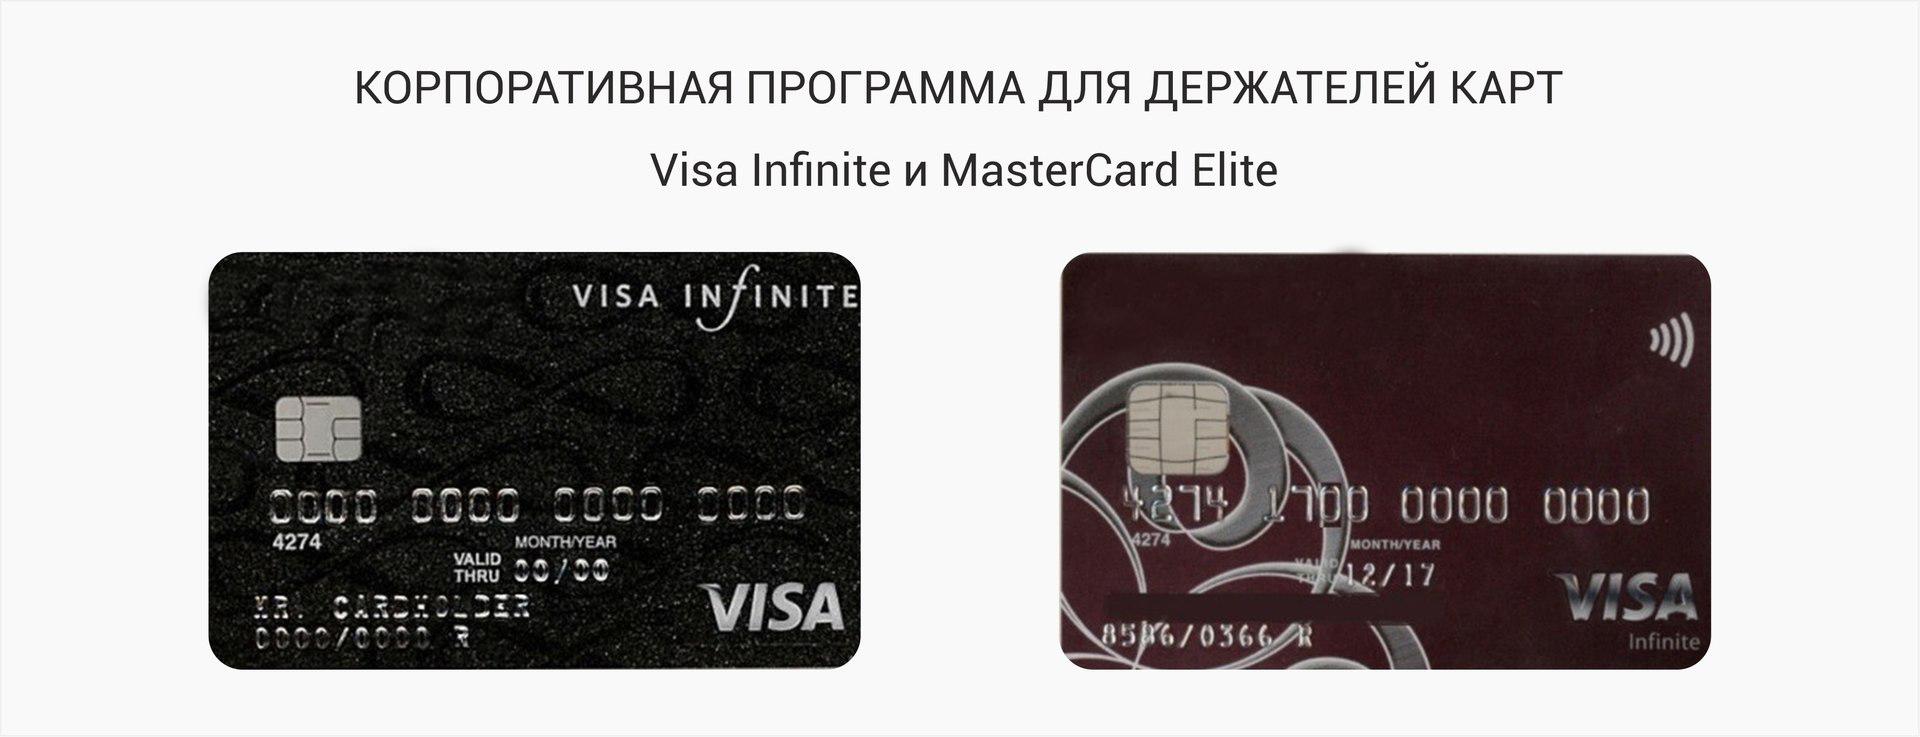 https://www.almazcom.ru/pub/img/QA/loyaltyprogram/3.jpg